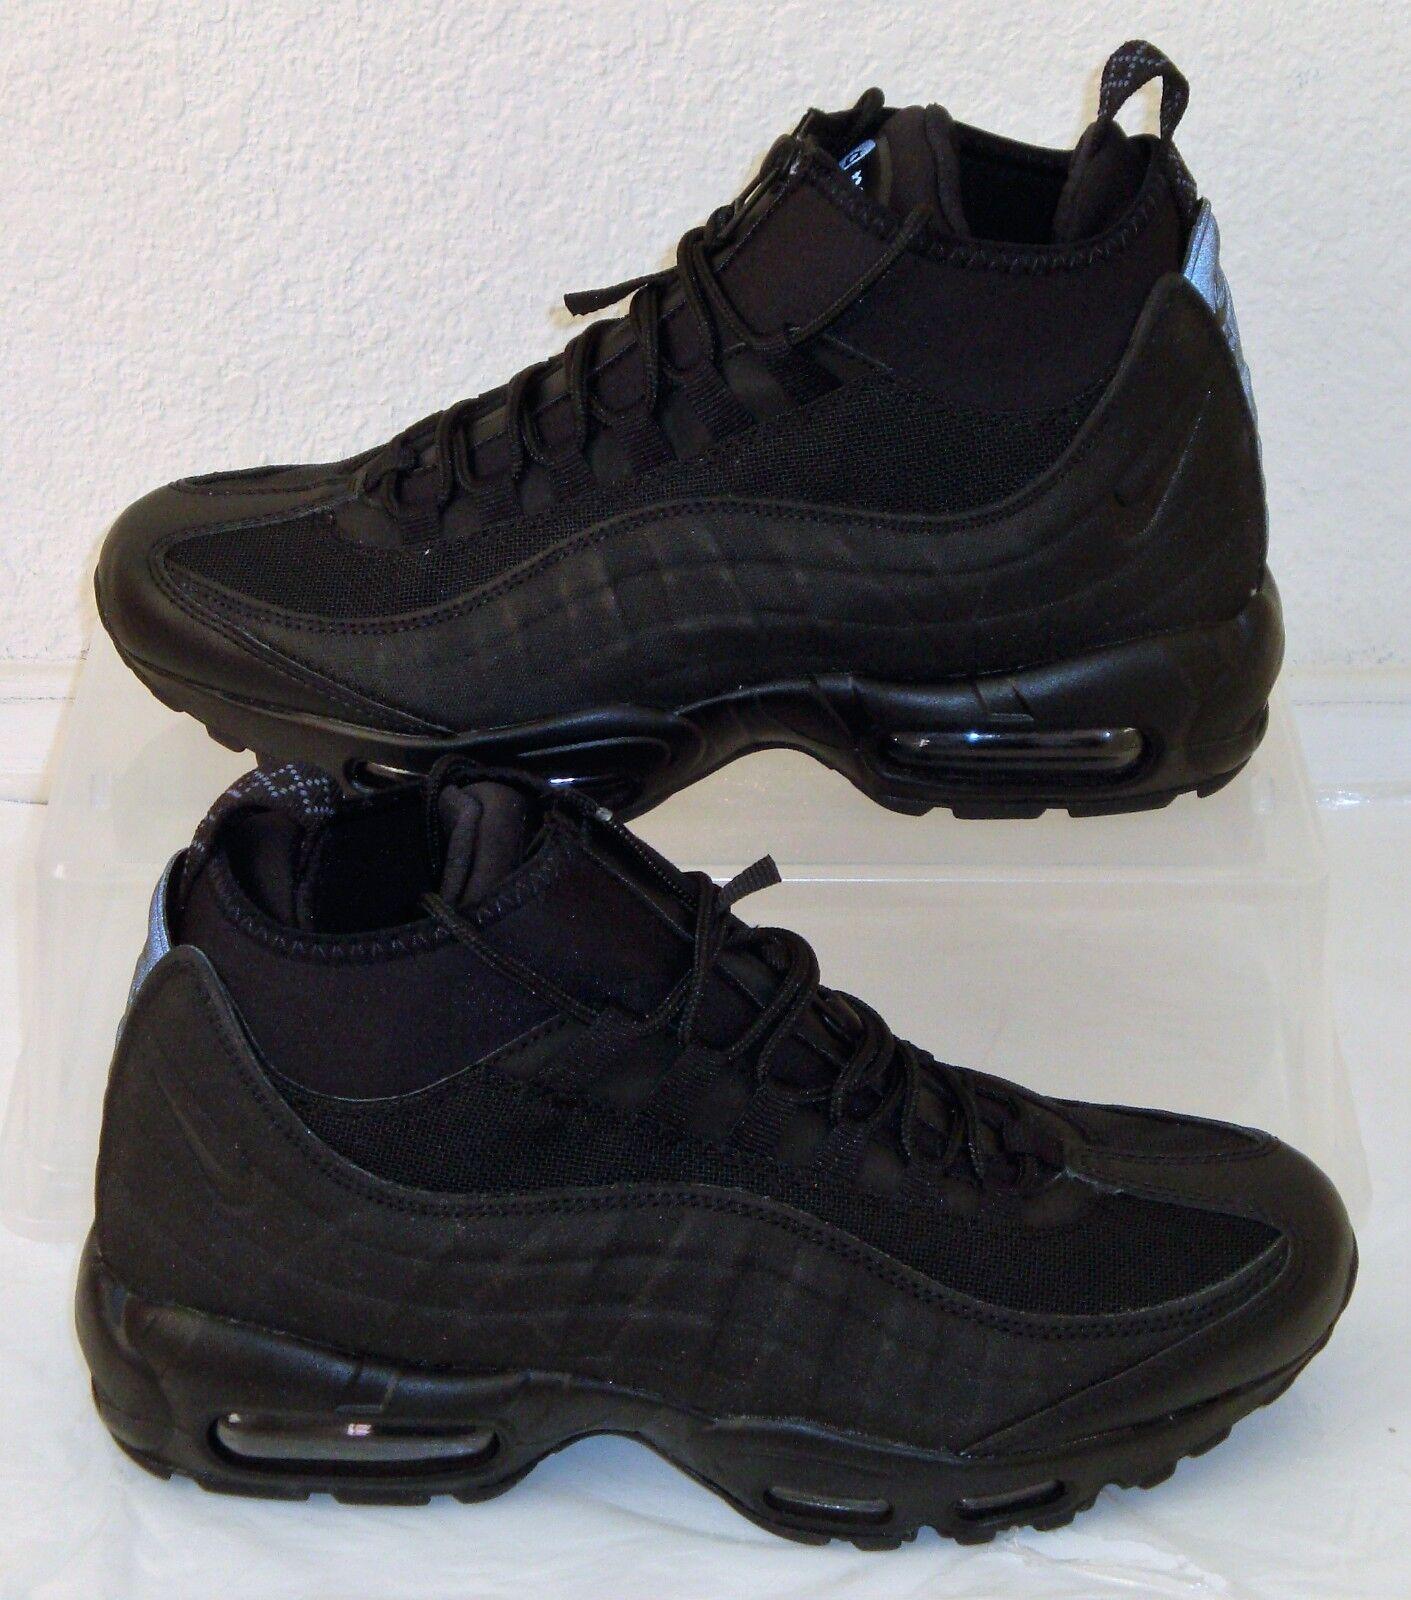 084a95836a New Nike Air 95 Sneakerboot Black Mens US 8 Max Size npgzjz4332 ...